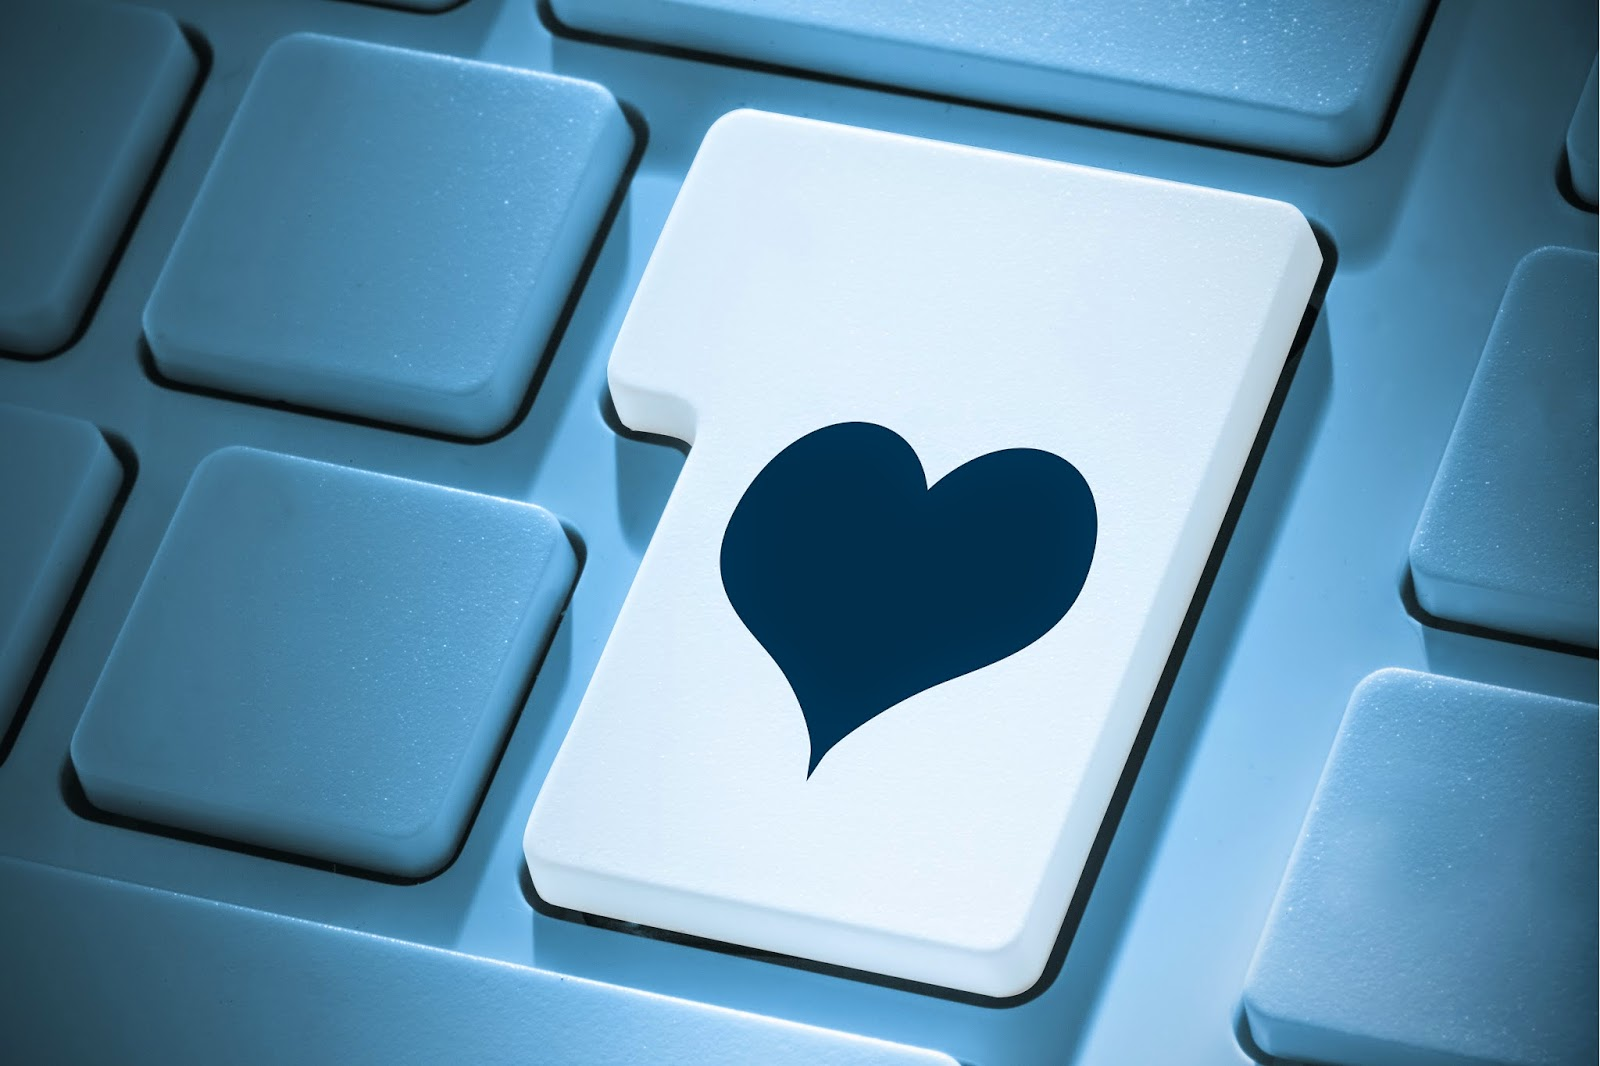 Heart on enter key